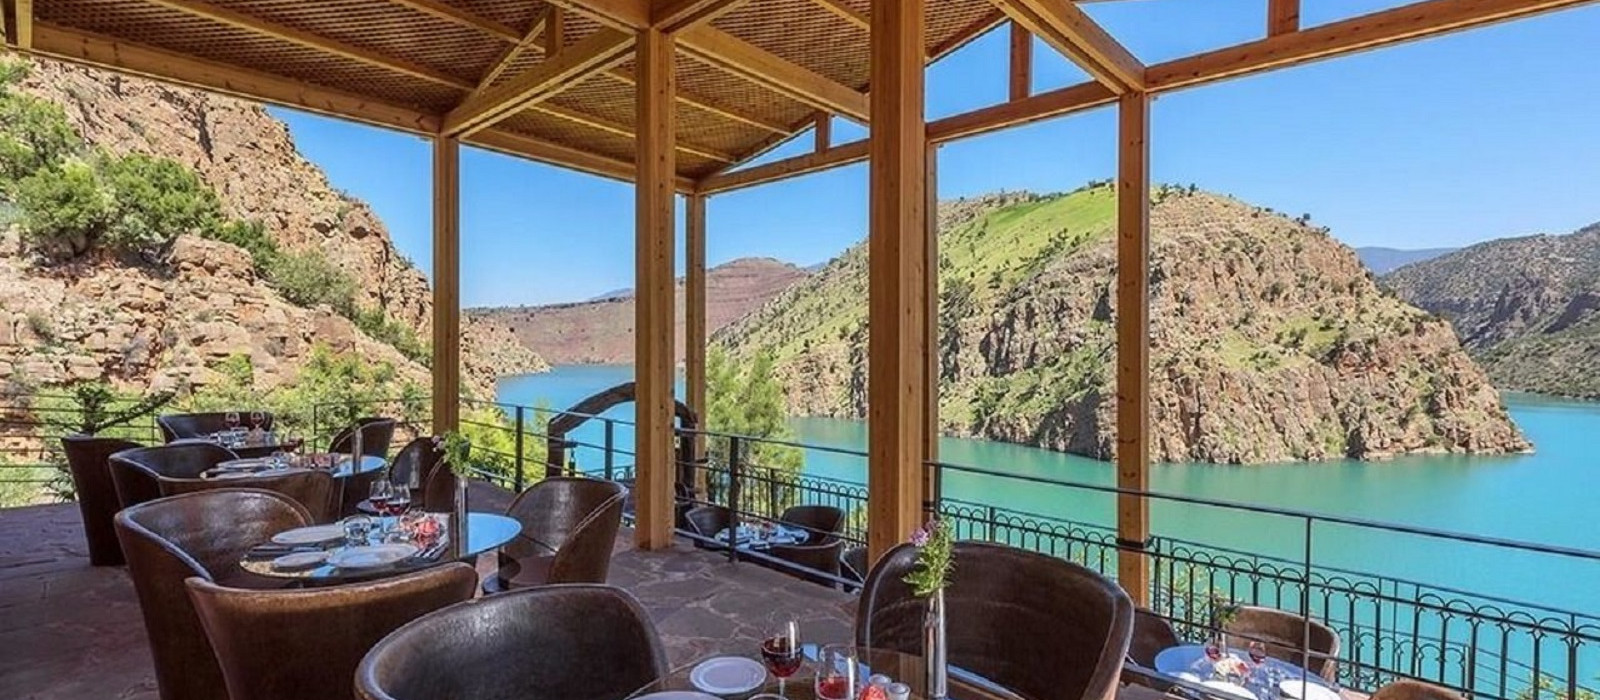 Hotel Widiane Suite & Spa Morocco